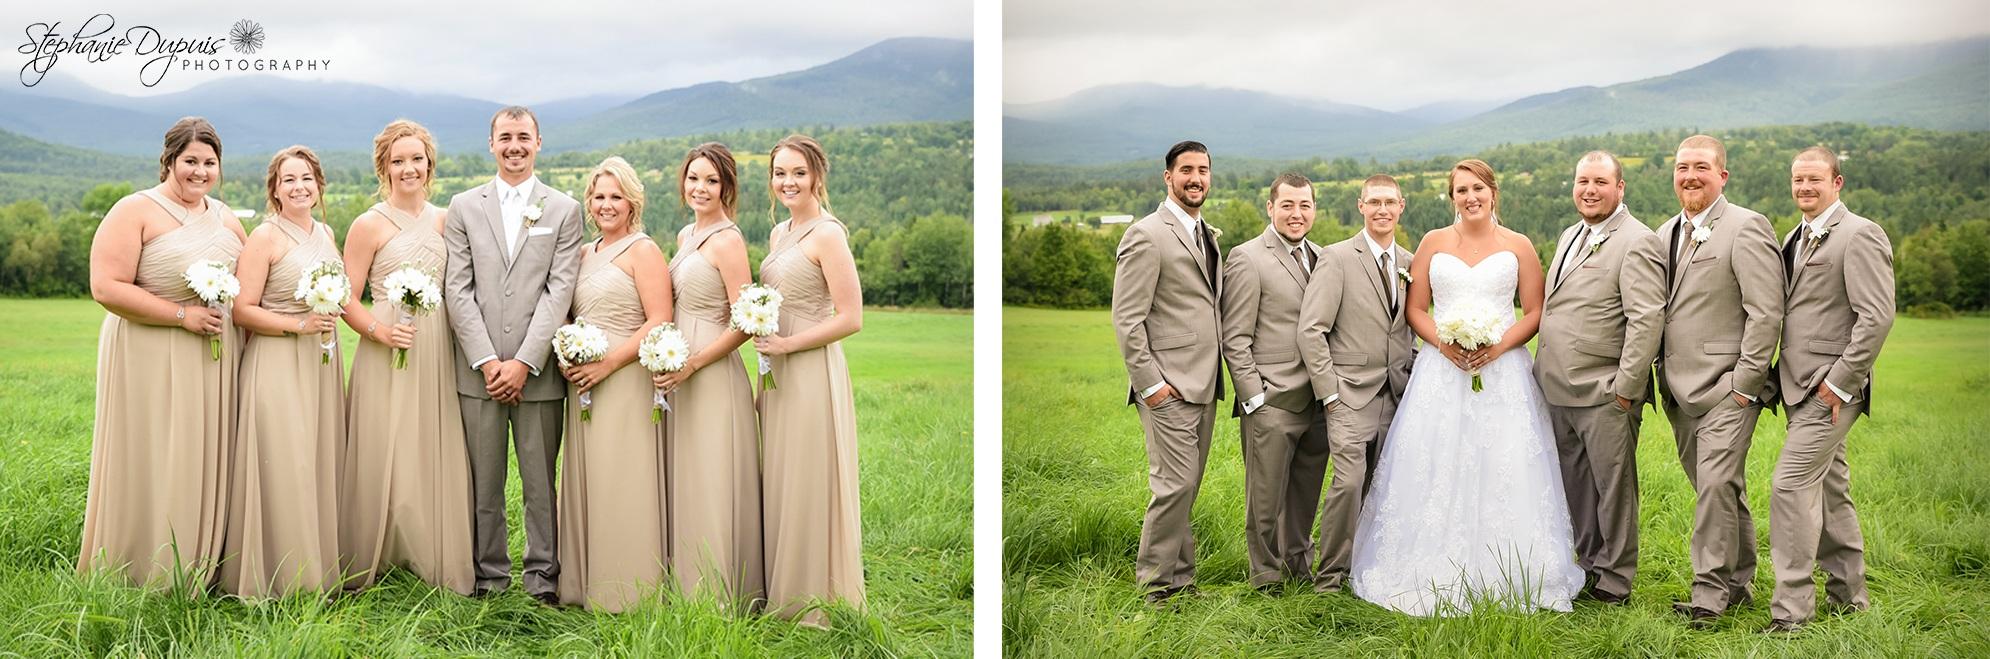 Jefferson Wedding Photographer 01 4 - Portfolio: Nason Wedding